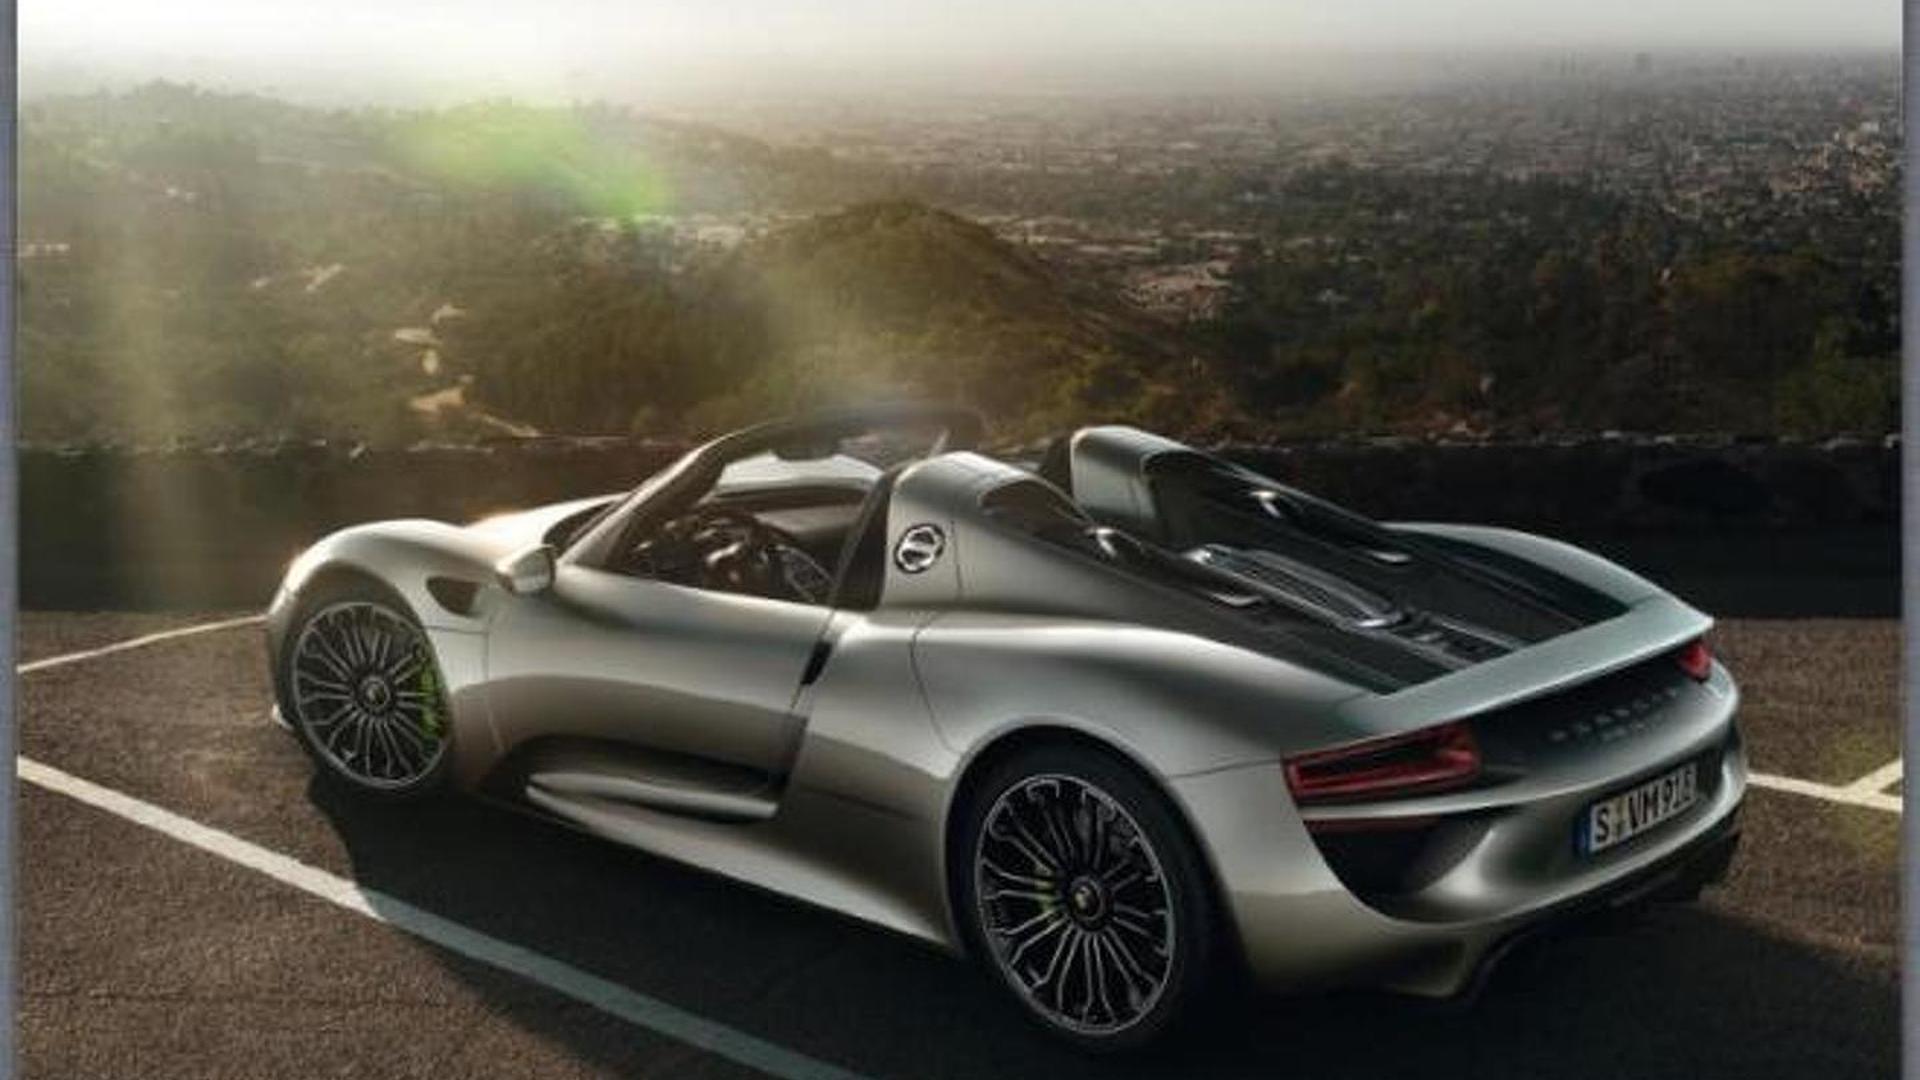 Porsche 918 Spyder revealed in leaked brochure?